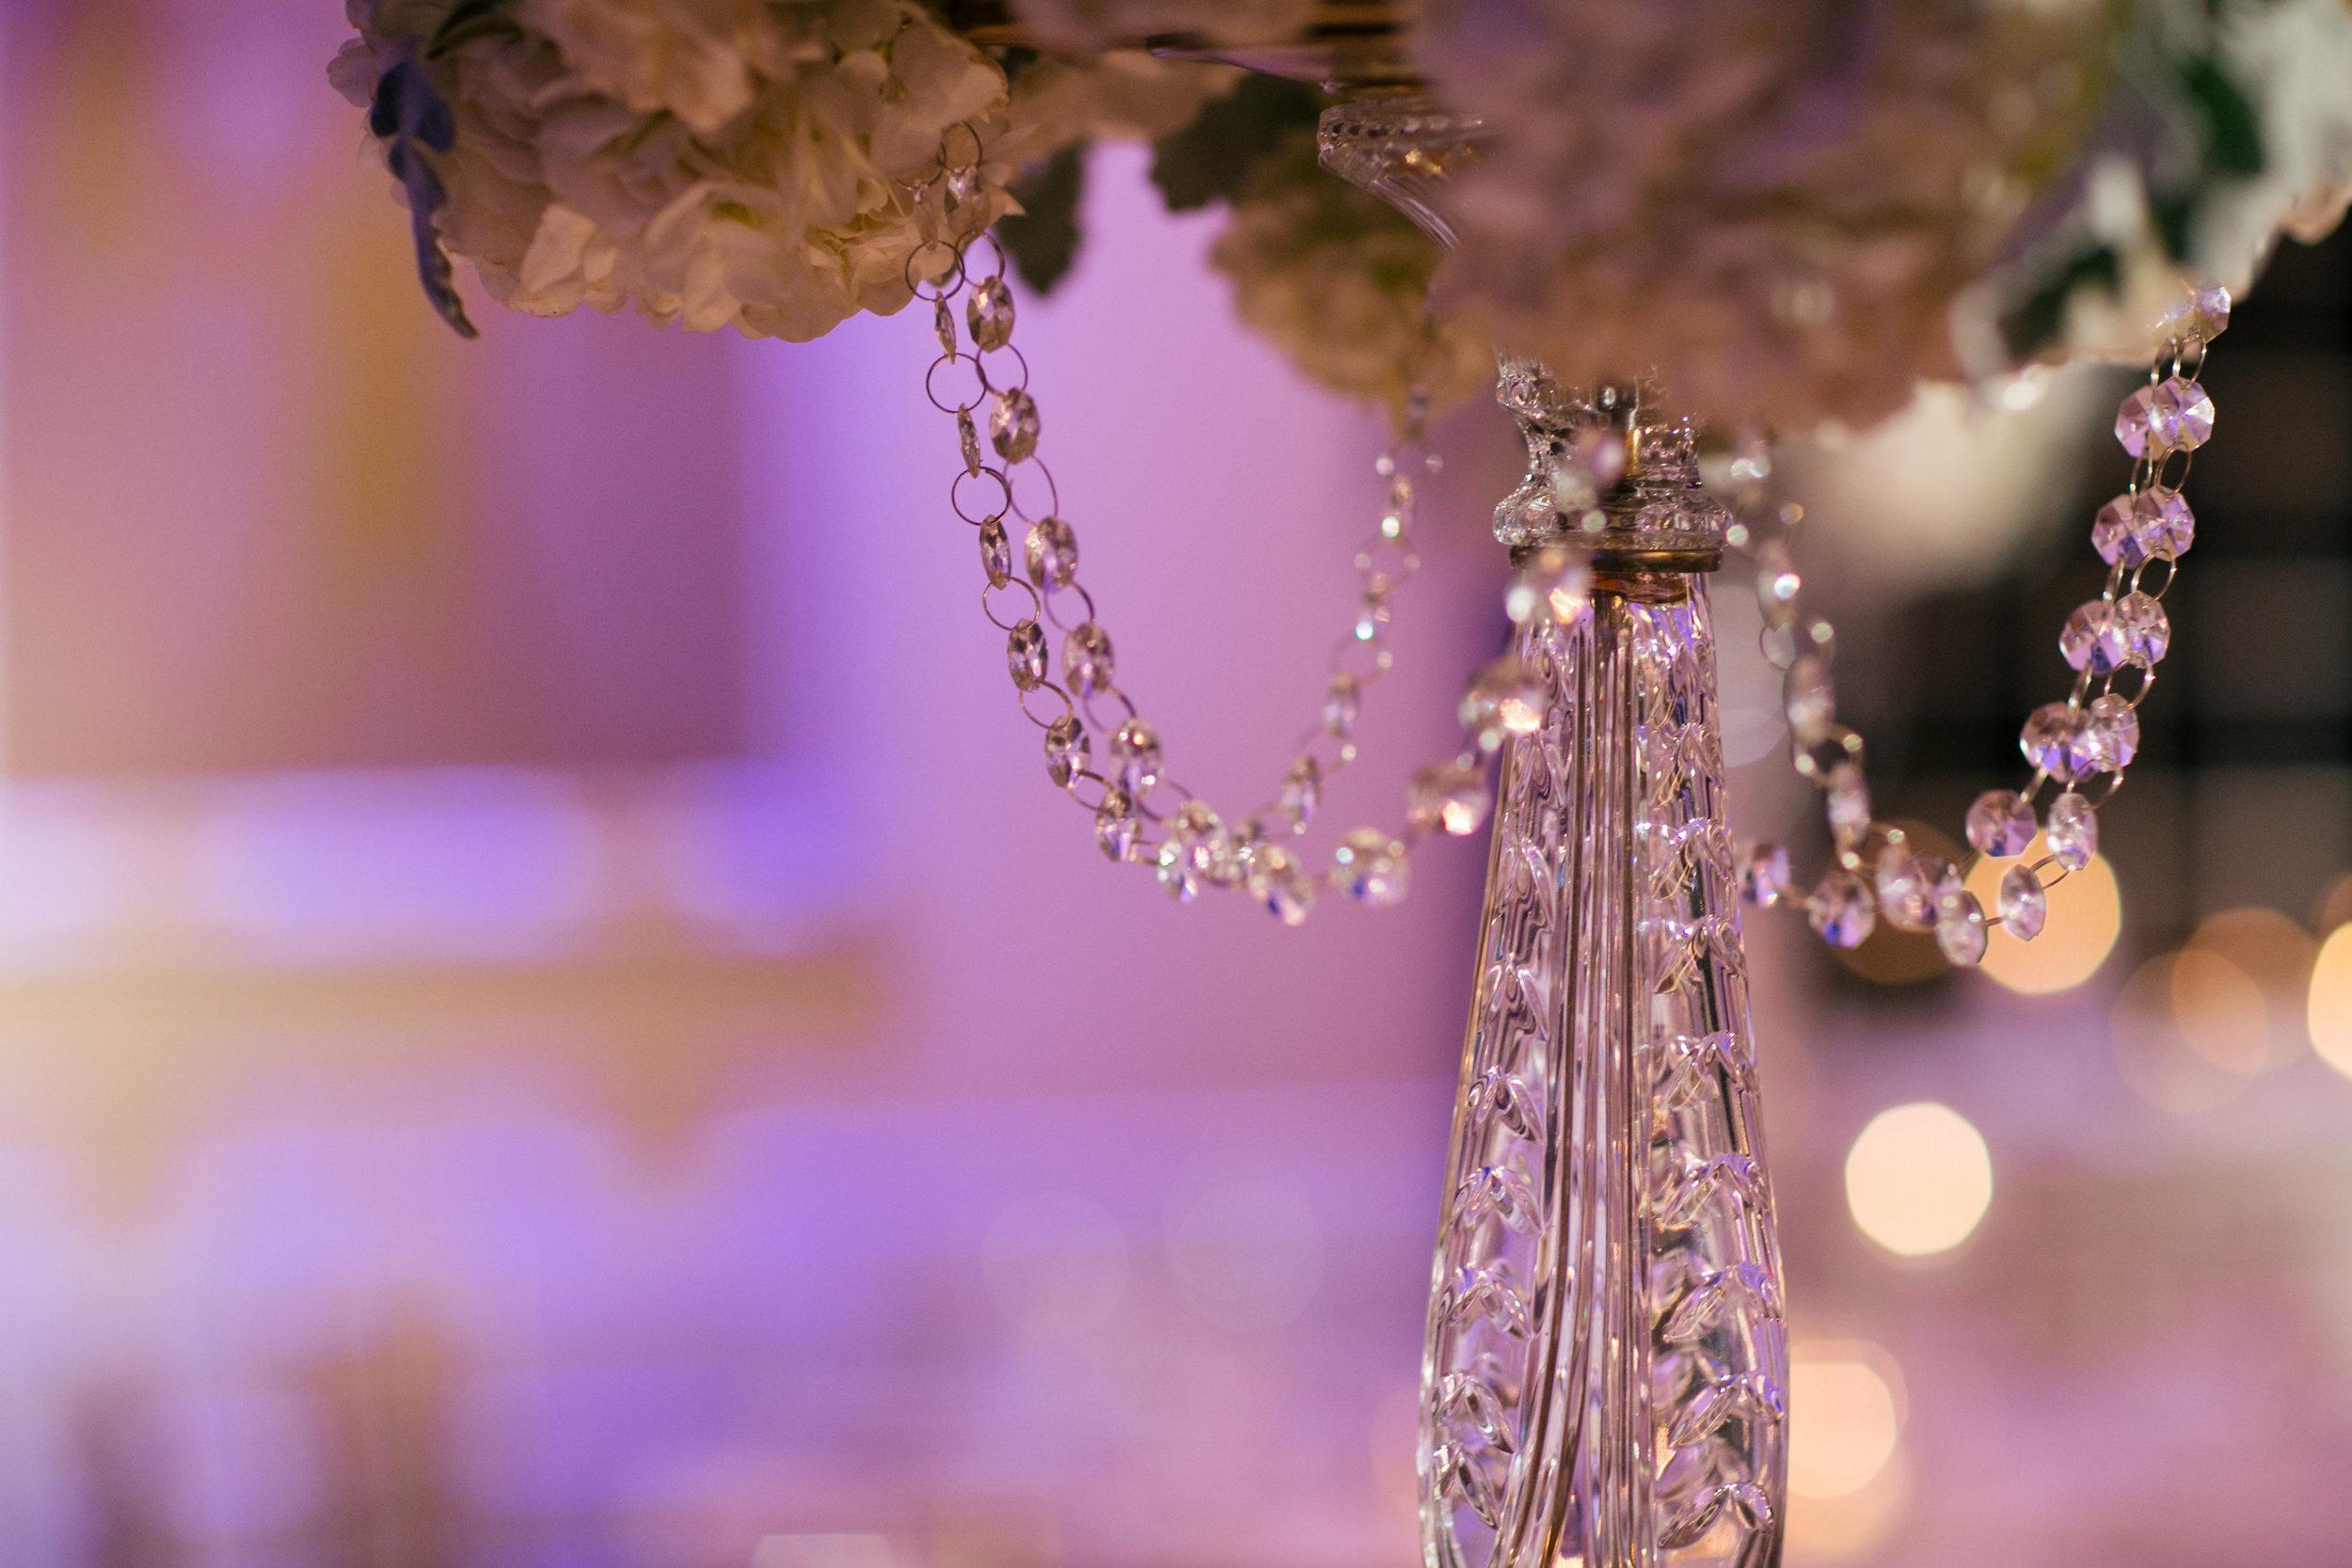 Ceci_New_York_Custom_Invitation_ New_Jersey_Wedding_Luxury_Personalized_Ceci_Style_Bride_Foil_Stamping57.jpg